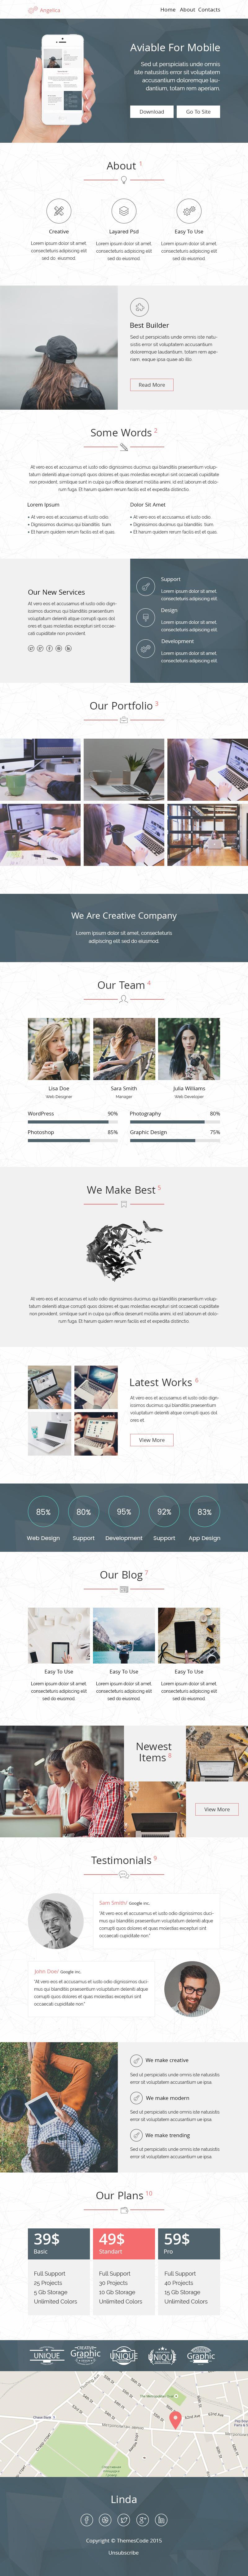 多款网页 UI模板designshidai_ui95